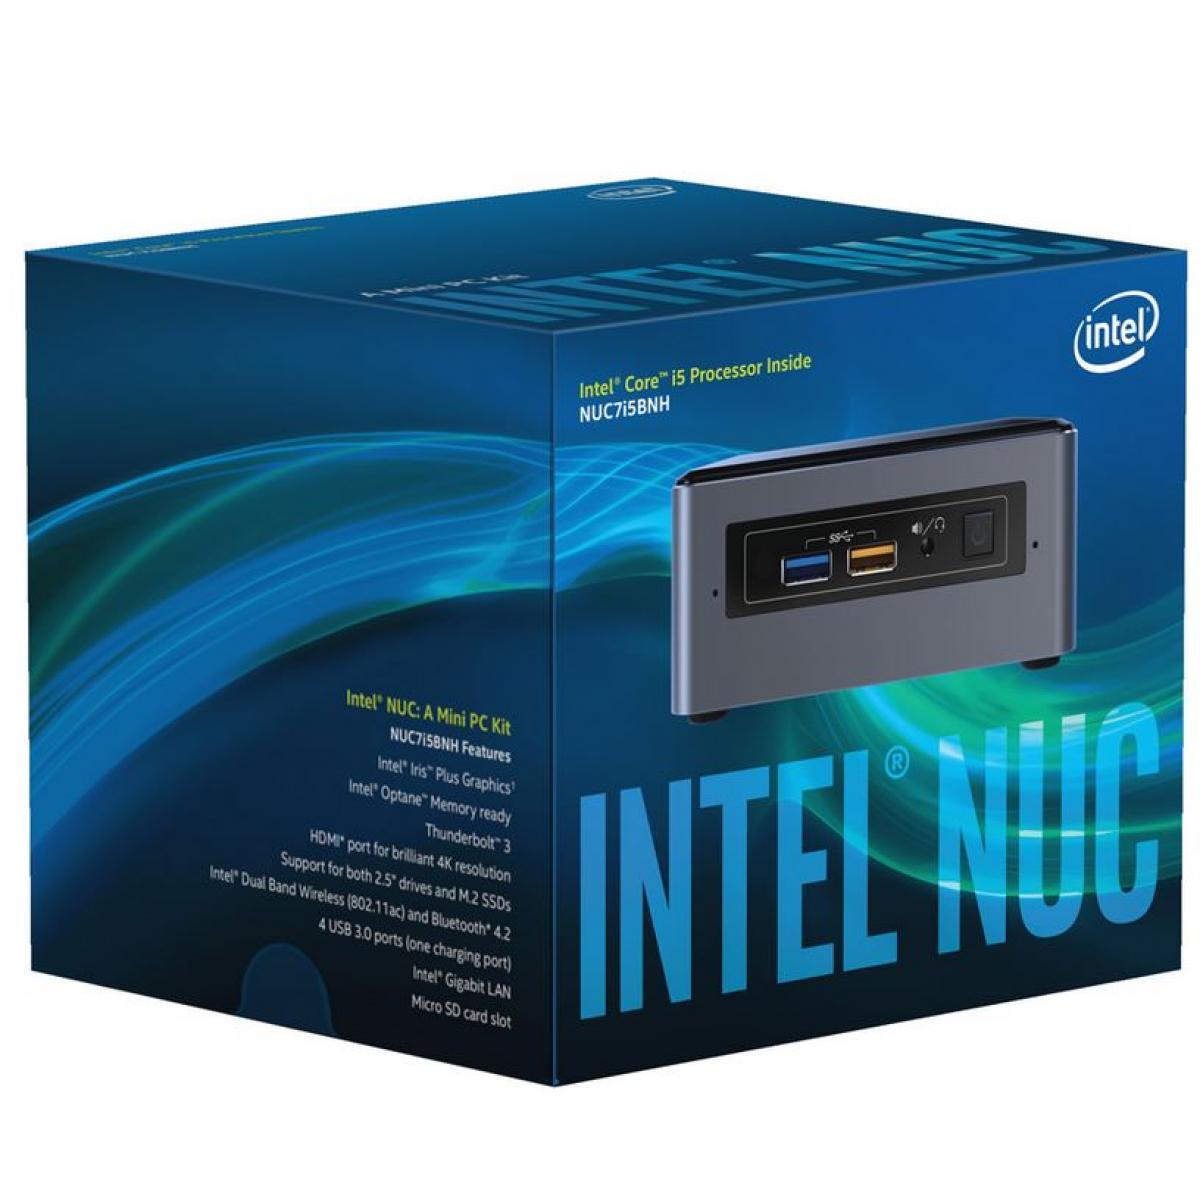 Intel NUC Kit Intel Core i5-7260U Mini PC Barebone